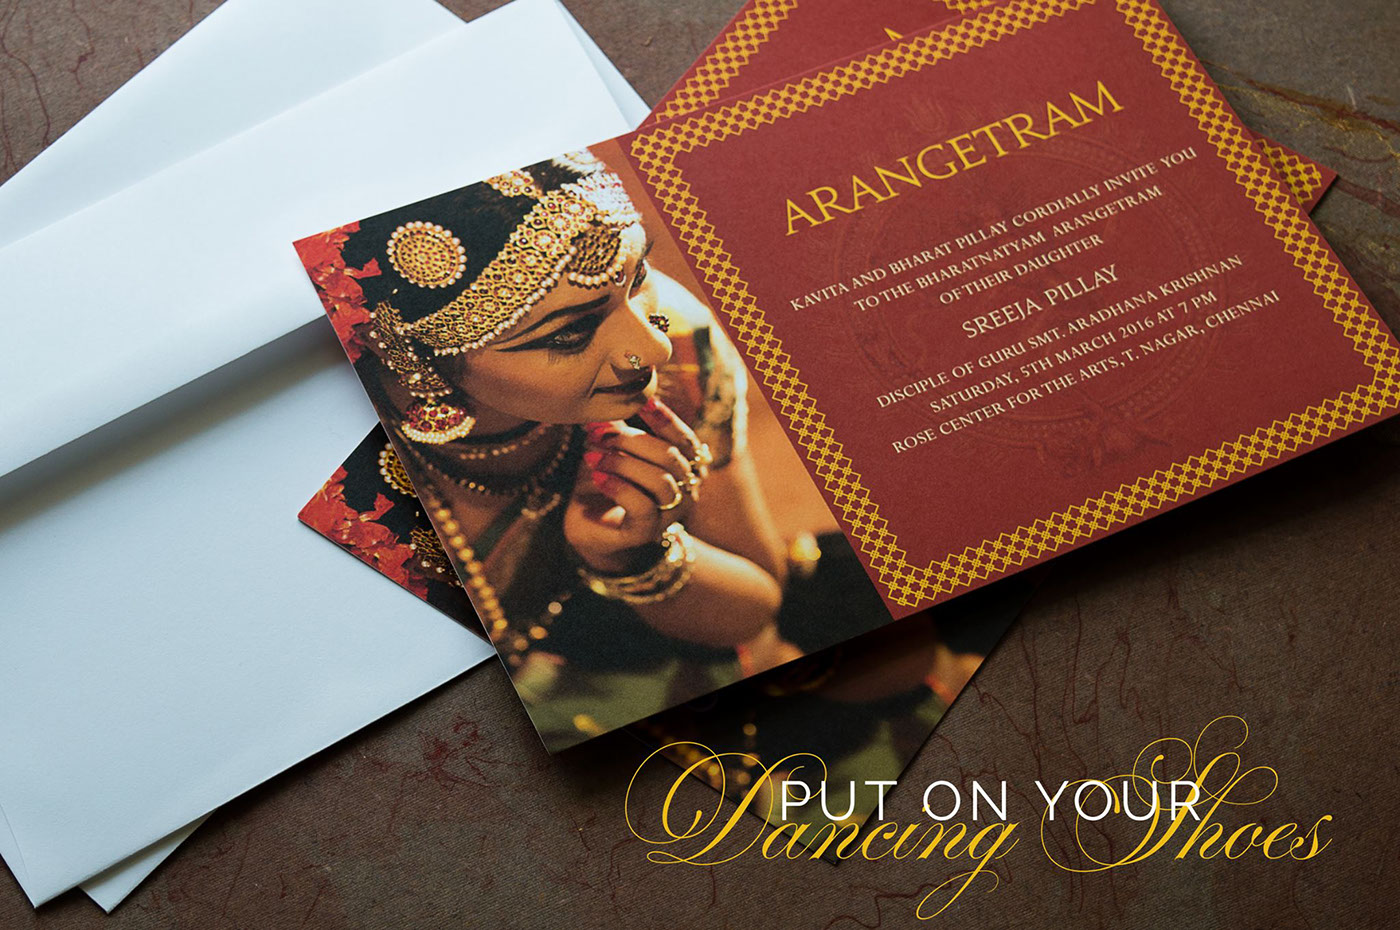 Earthy Nataraja Arangetram Invitation For Inksedge On Behance